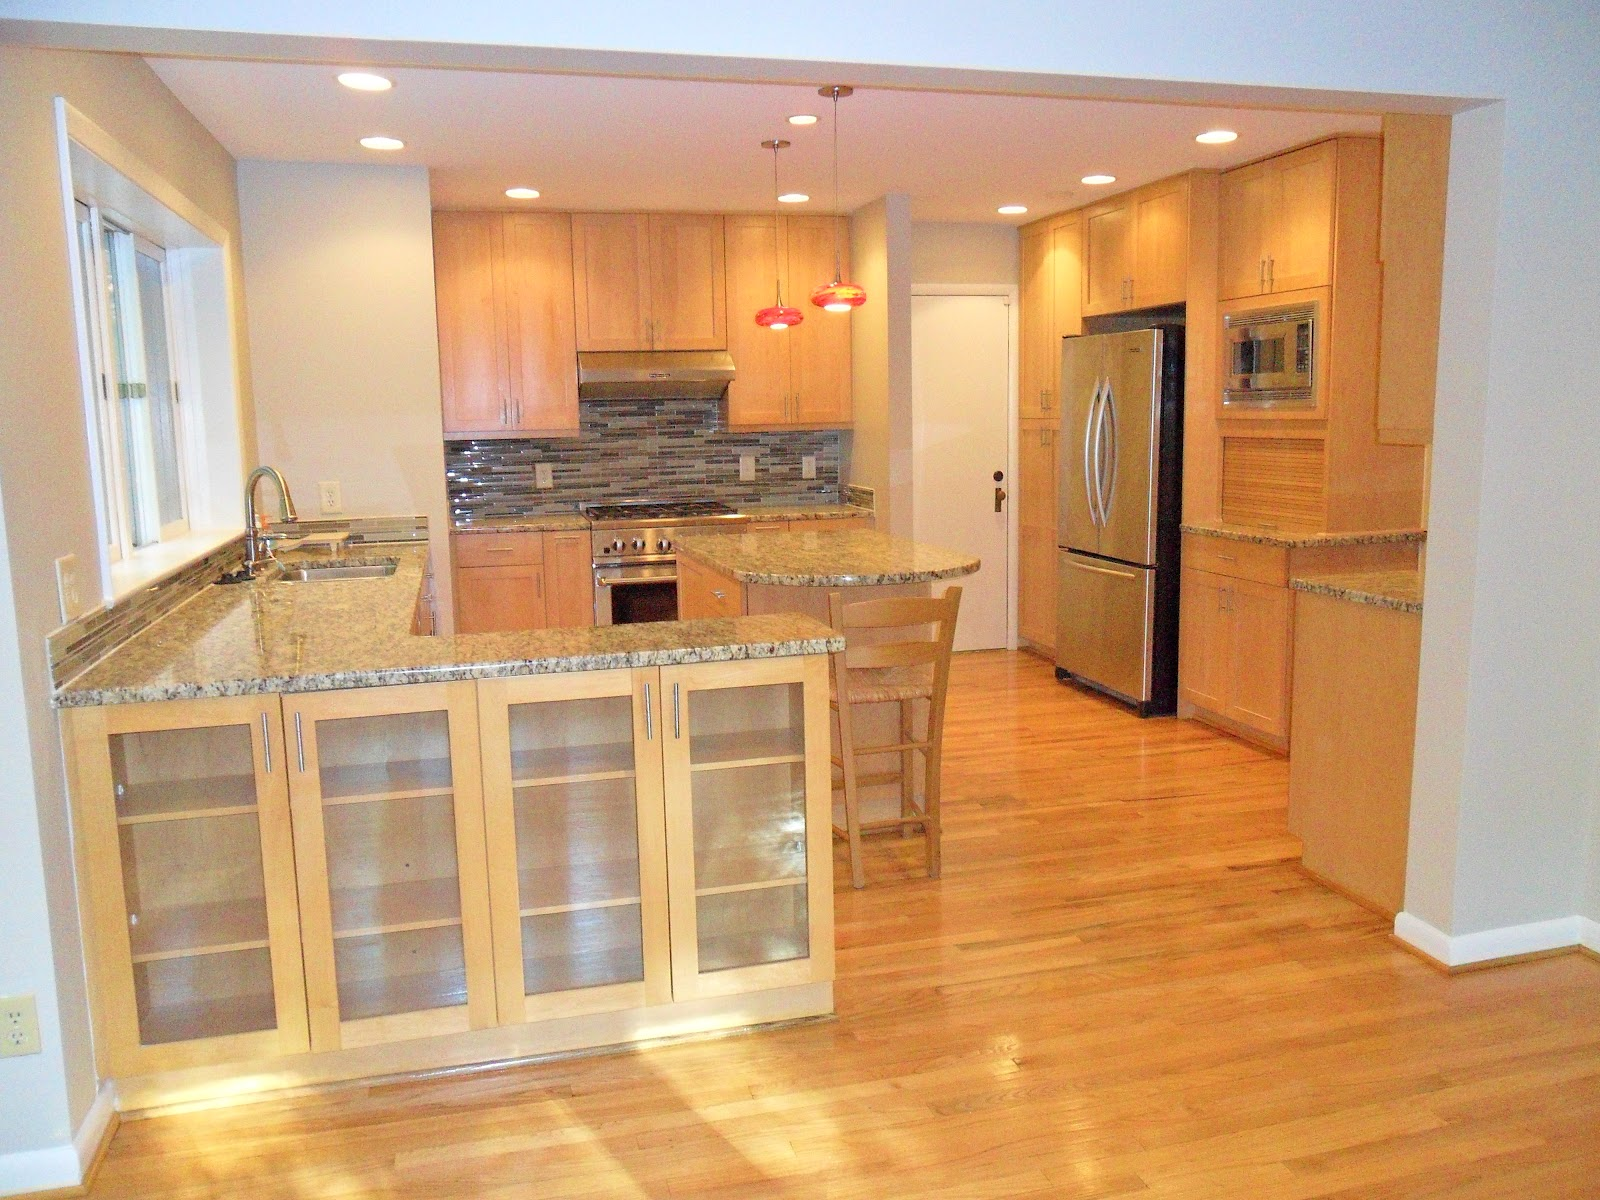 w d osborne design construction 919 493 2936 family spaces